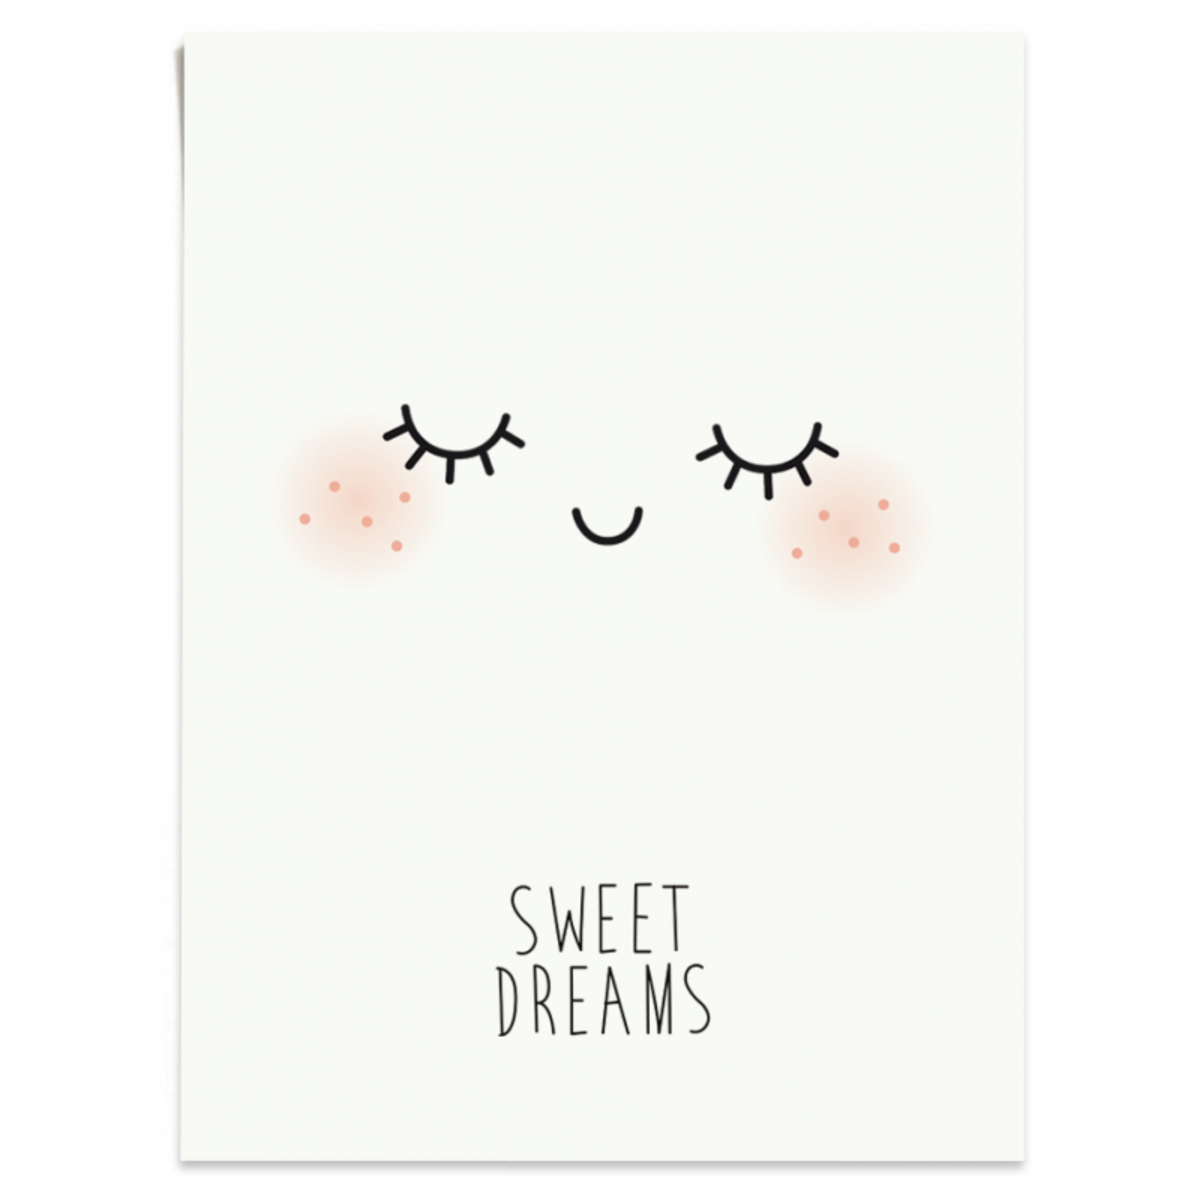 Affiche & poster Affiche Sweet Dreams Affiche Sweet Dreams